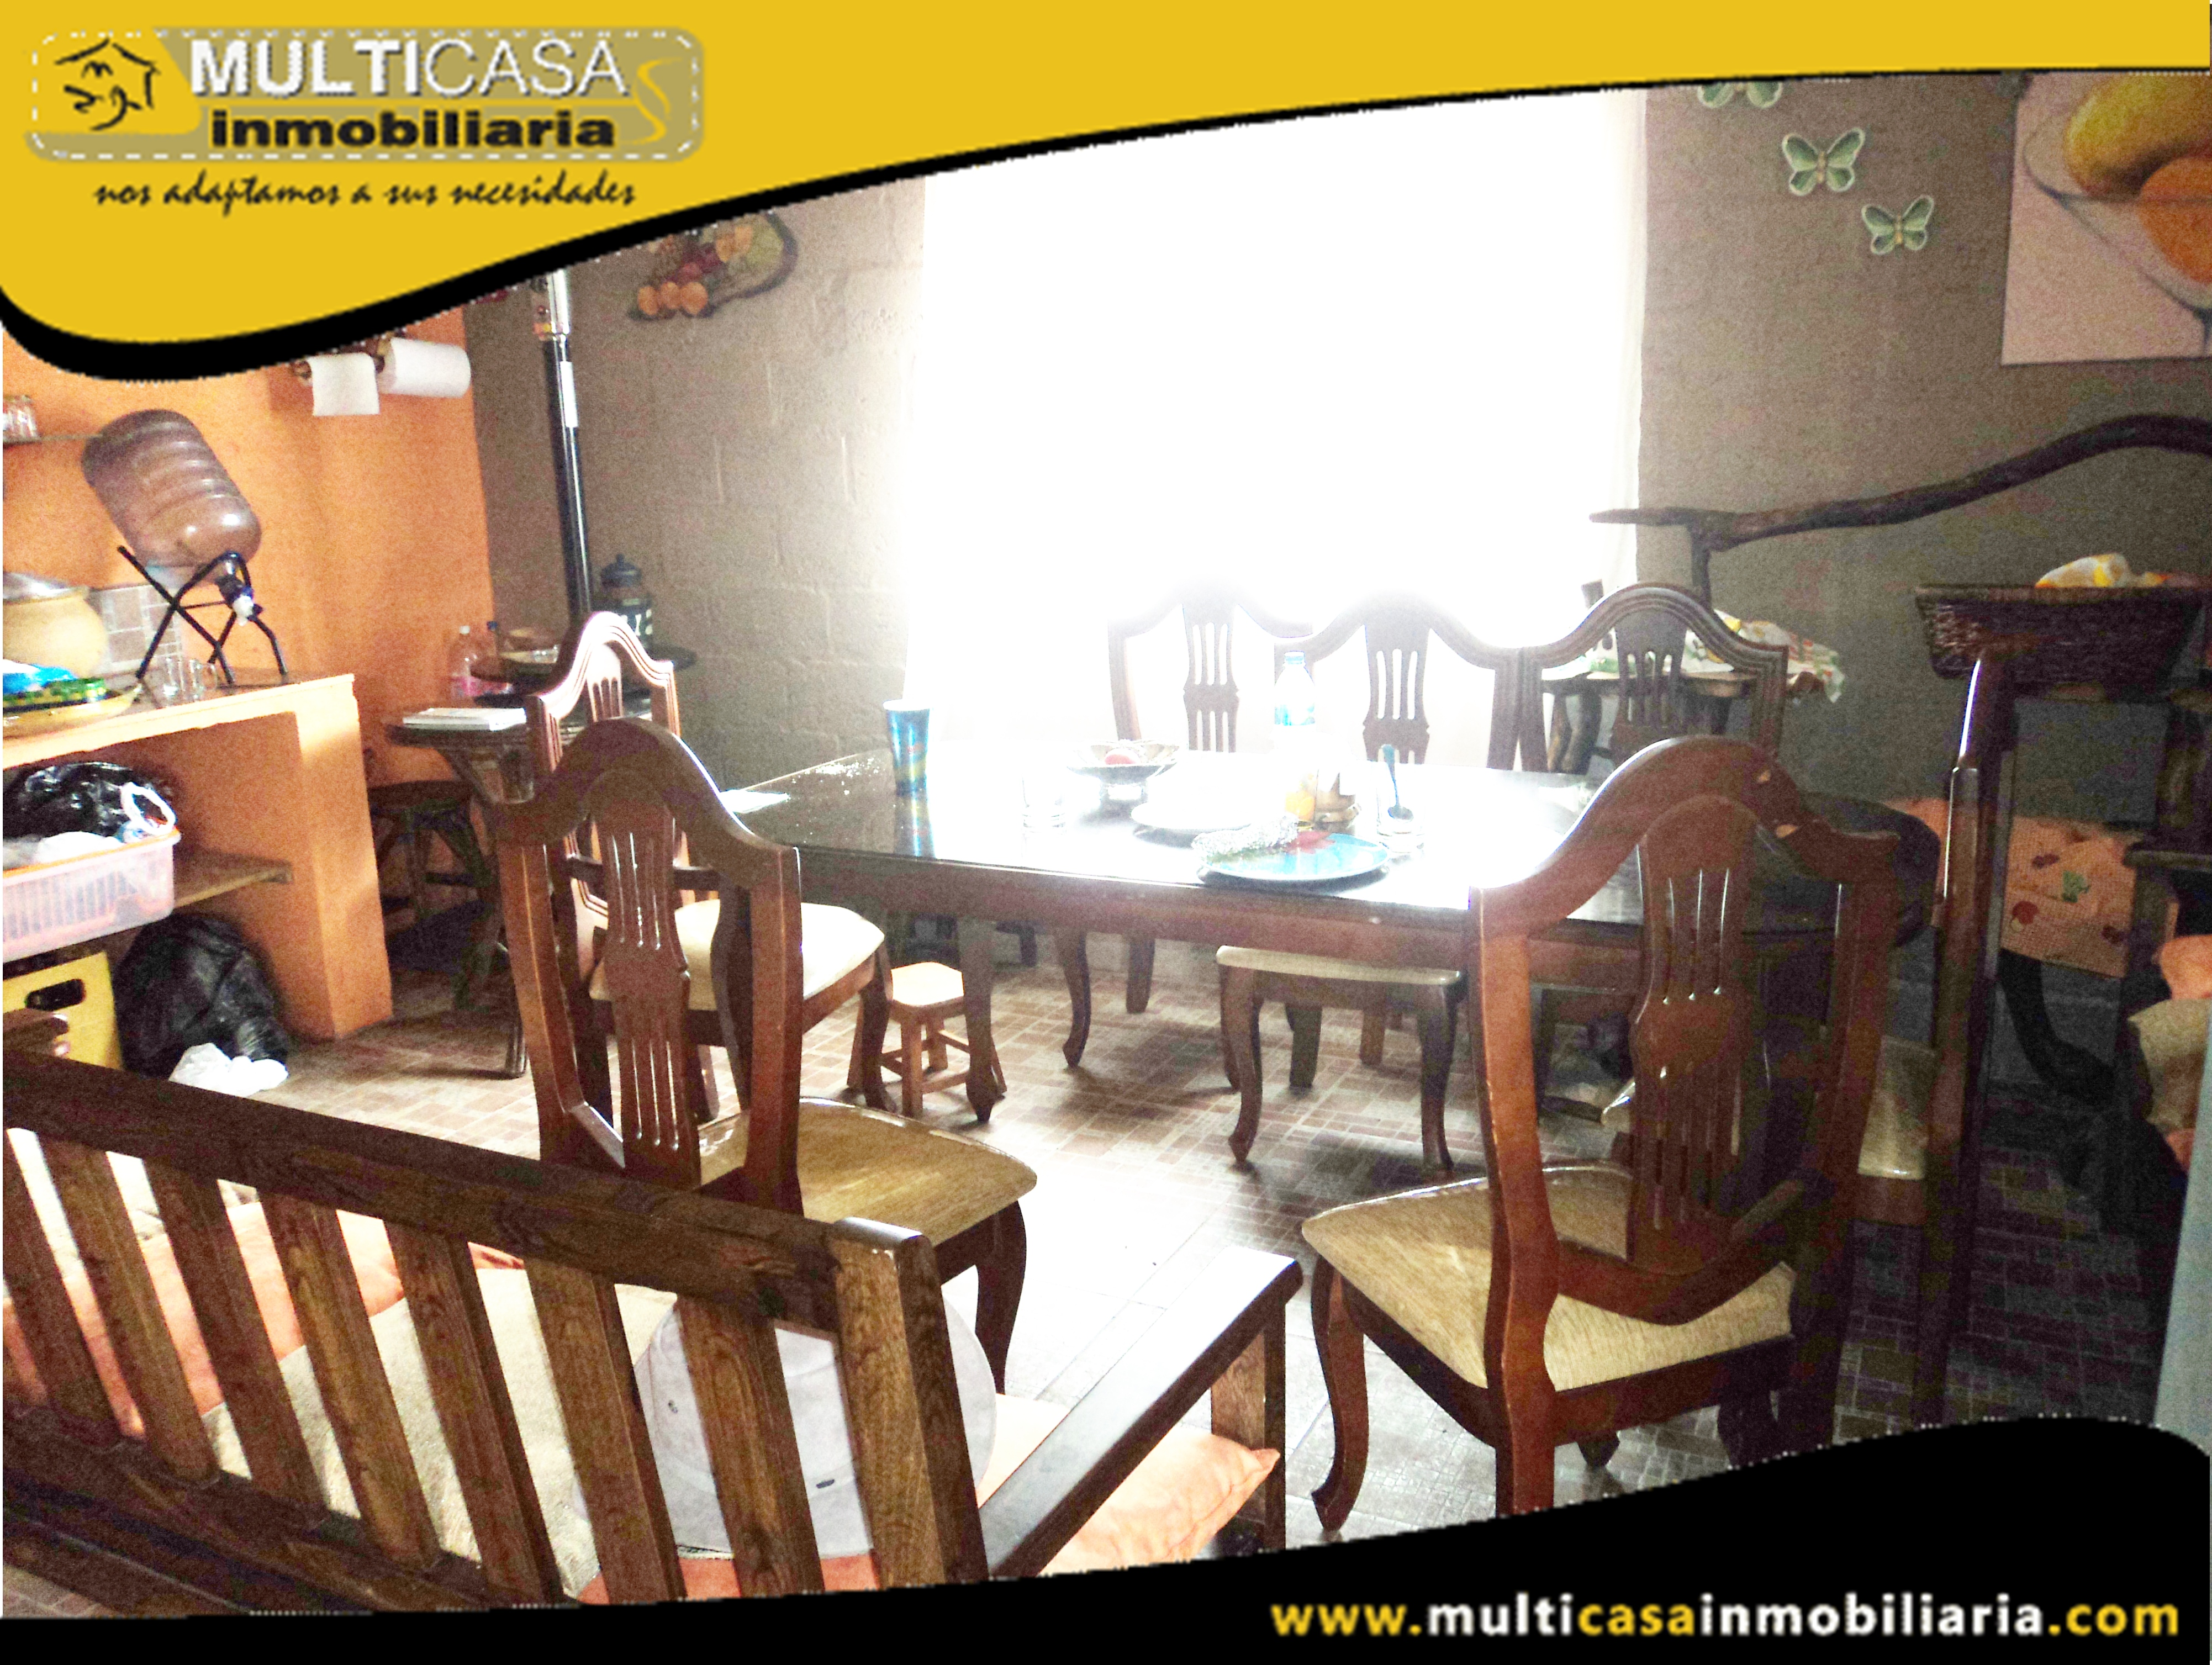 Hacienda en Venta bañada en Agua Sector Tarqui-Atucloma Cuenca-Ecuador